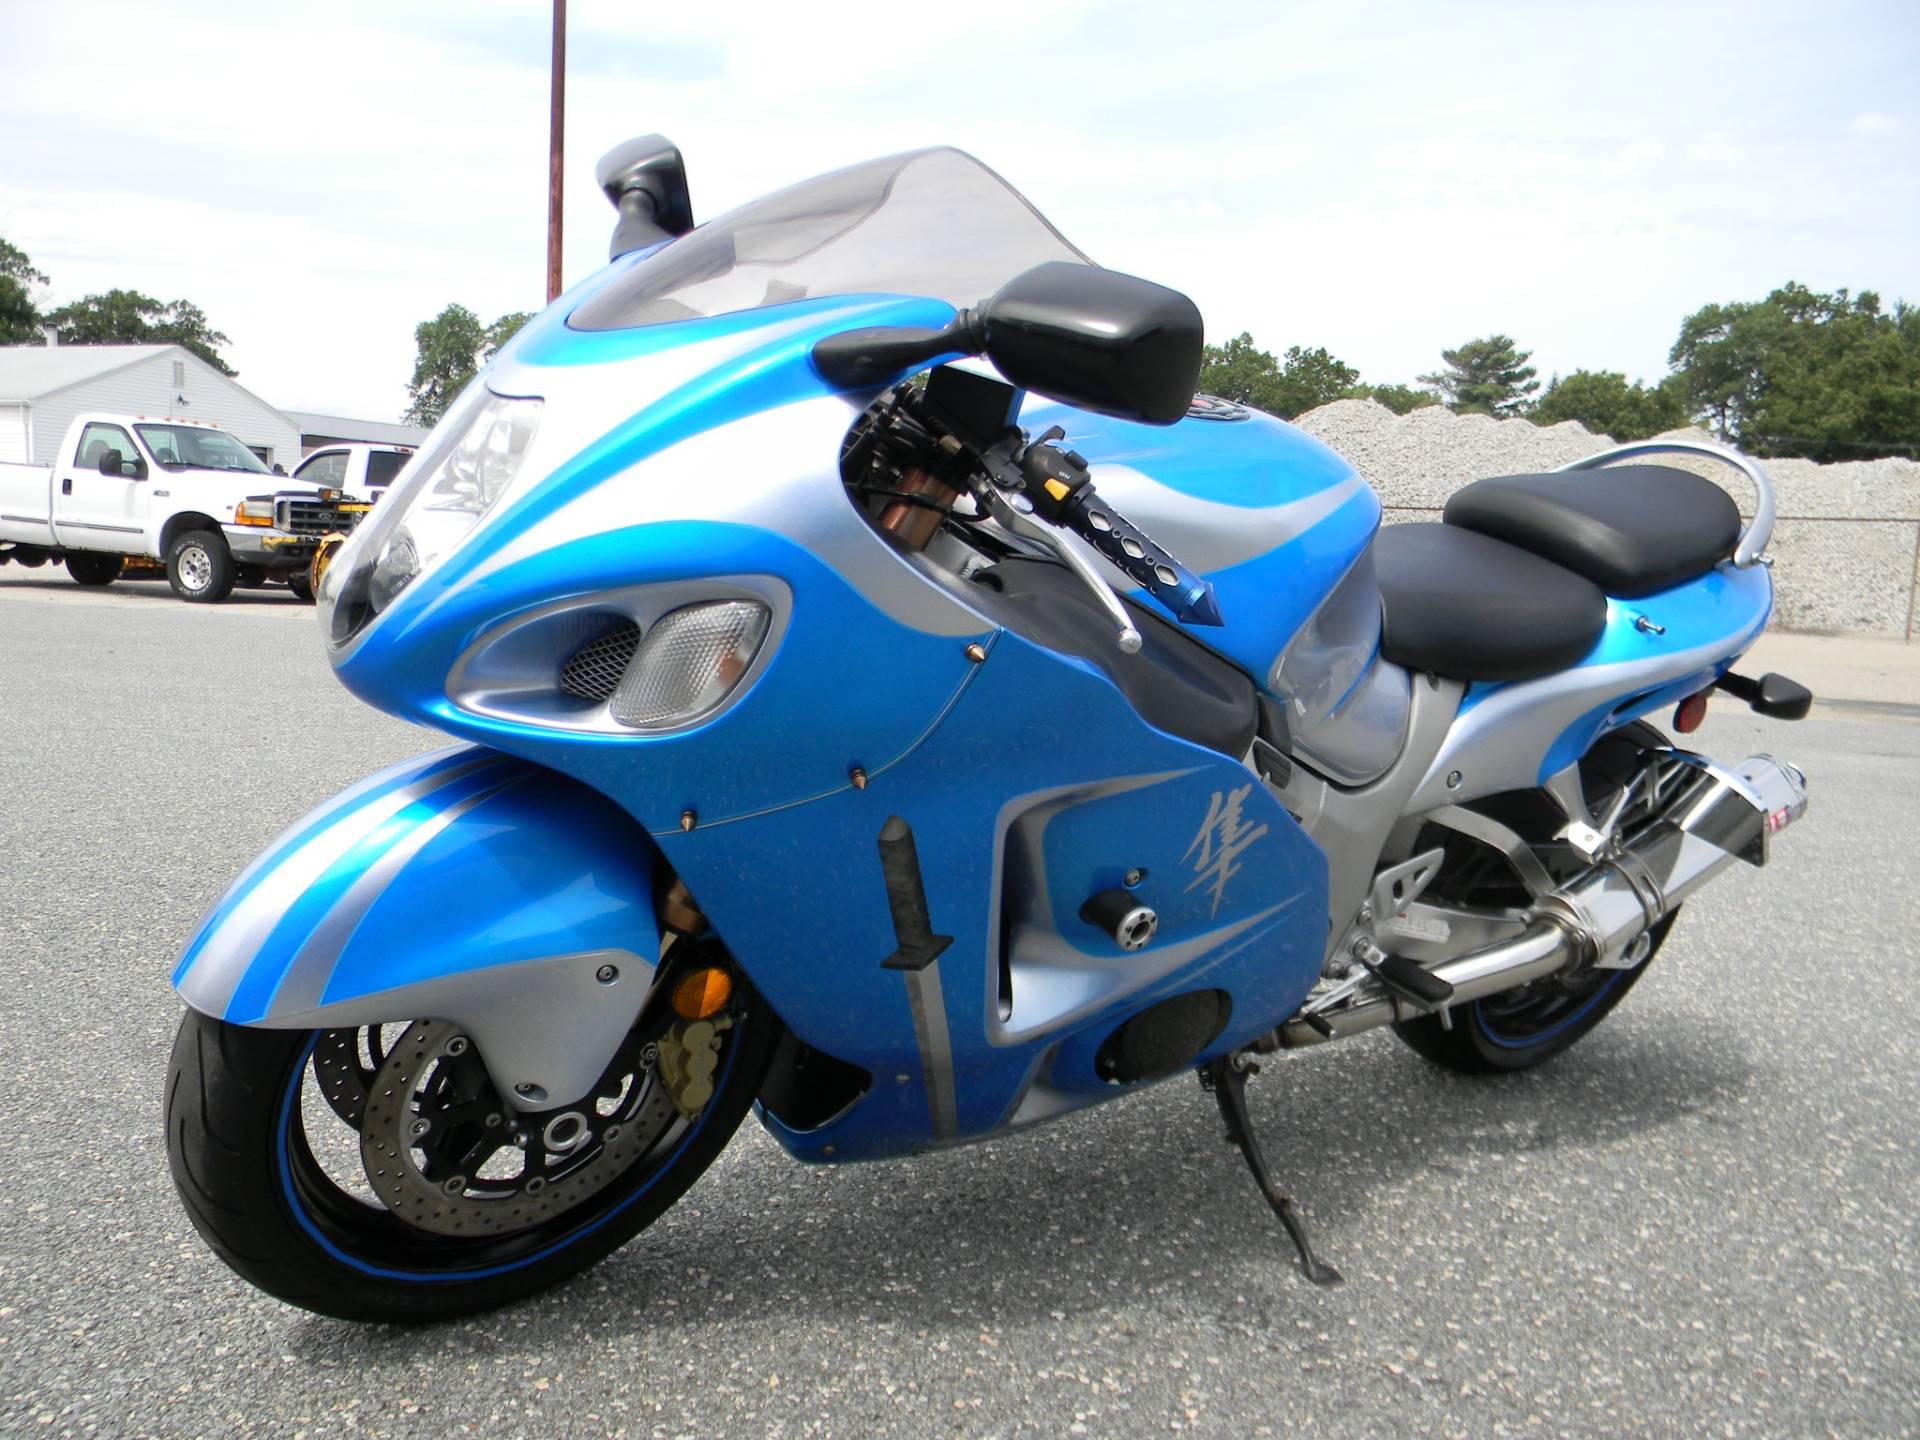 2005 Suzuki Hayabusa 4